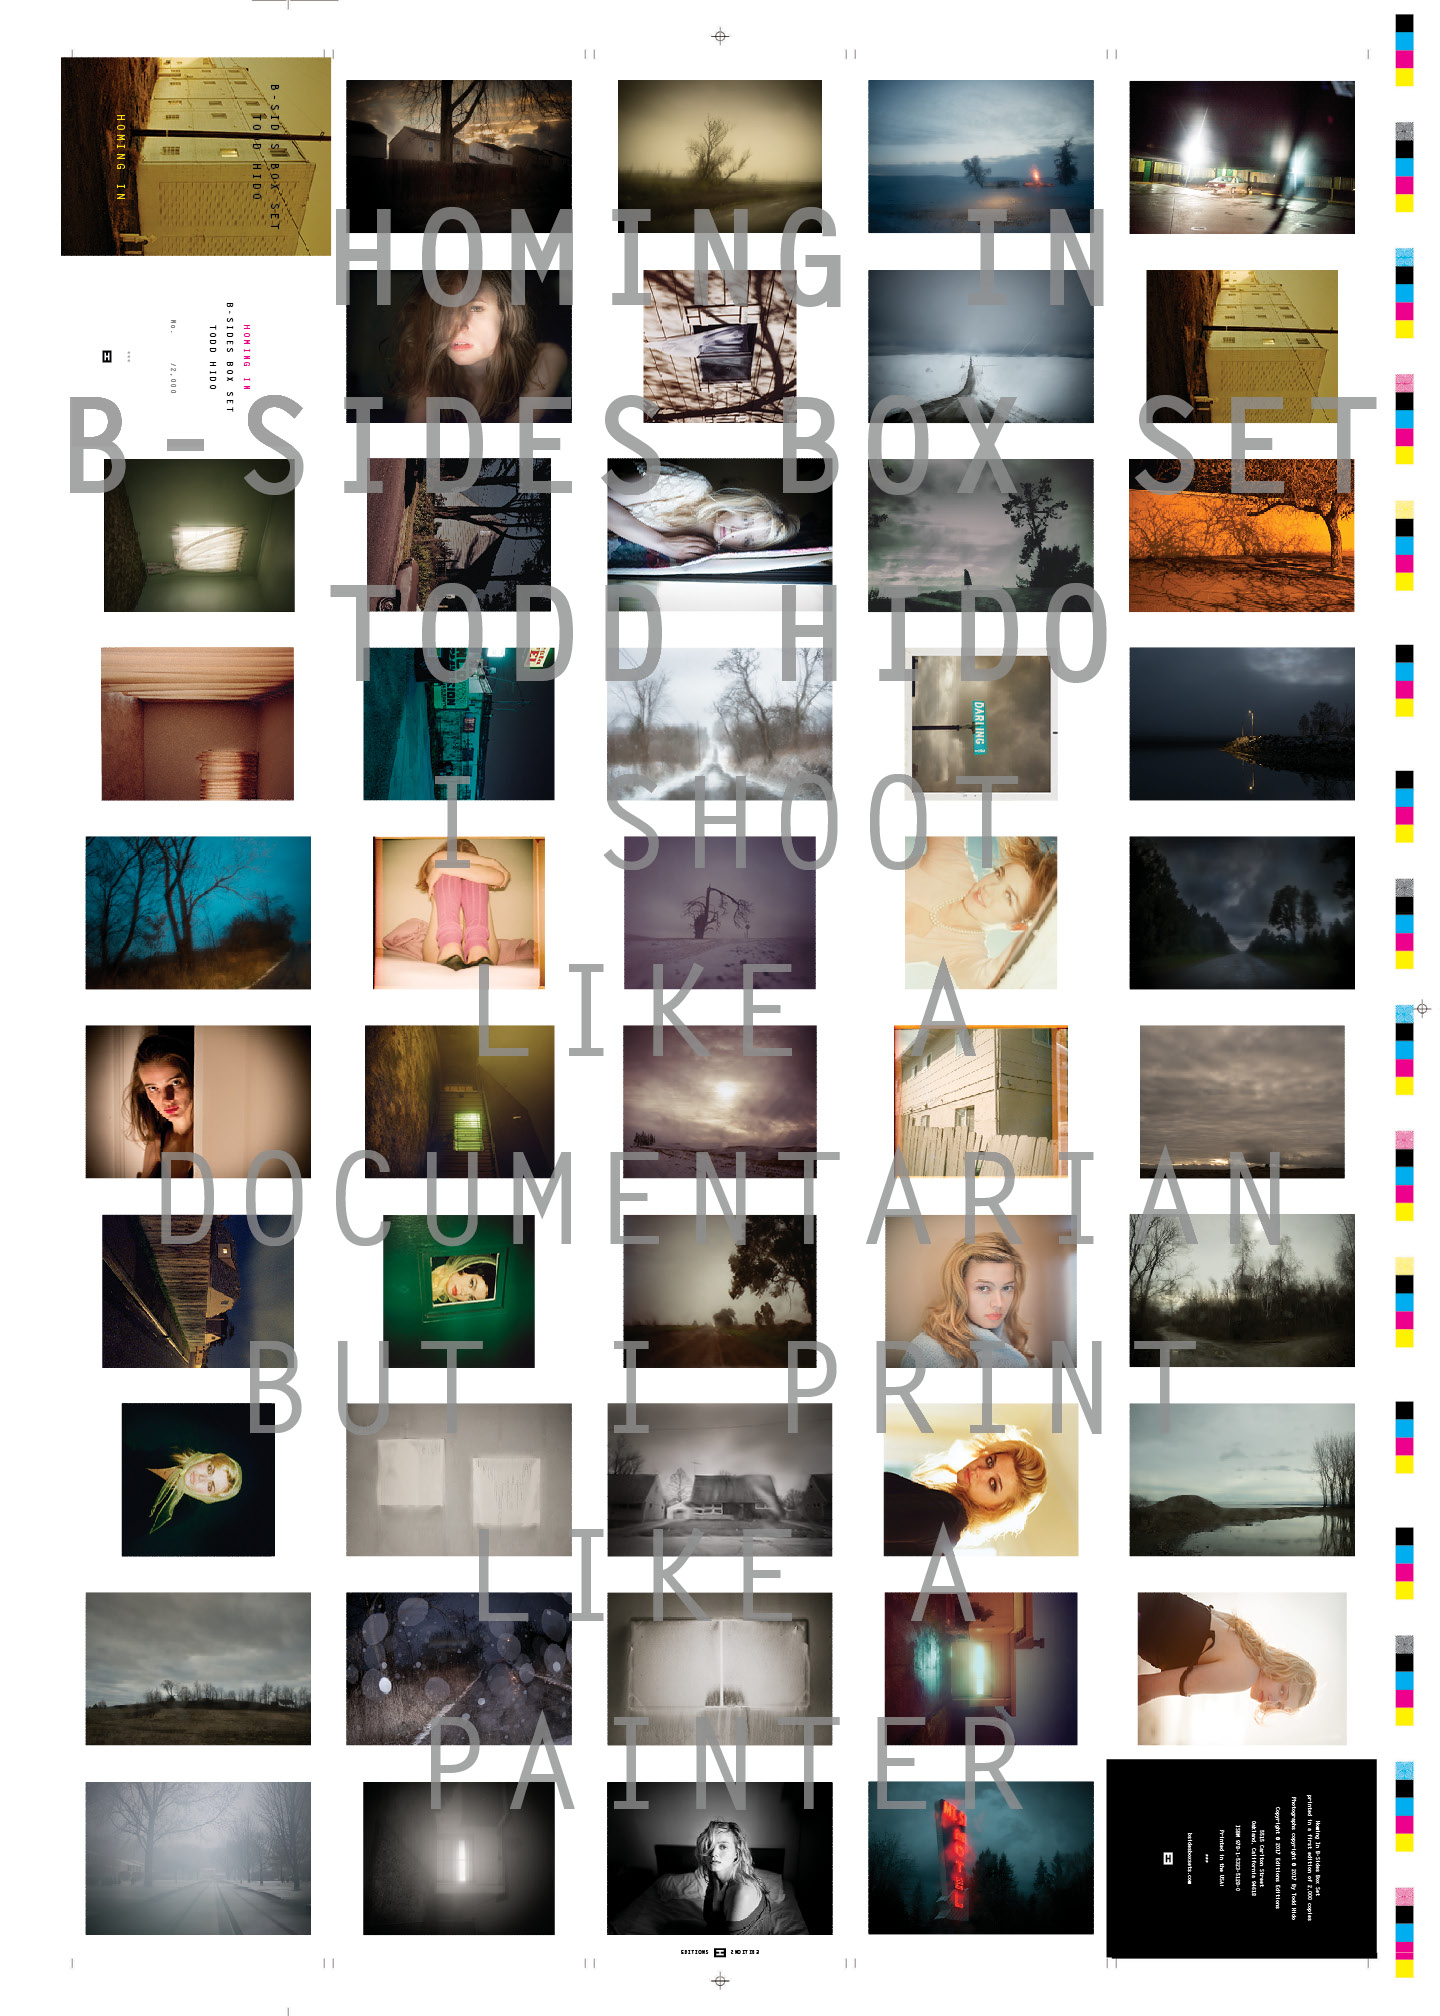 Hido_B-Side_Box_Set_2017_POSTER_72ppi.jpg